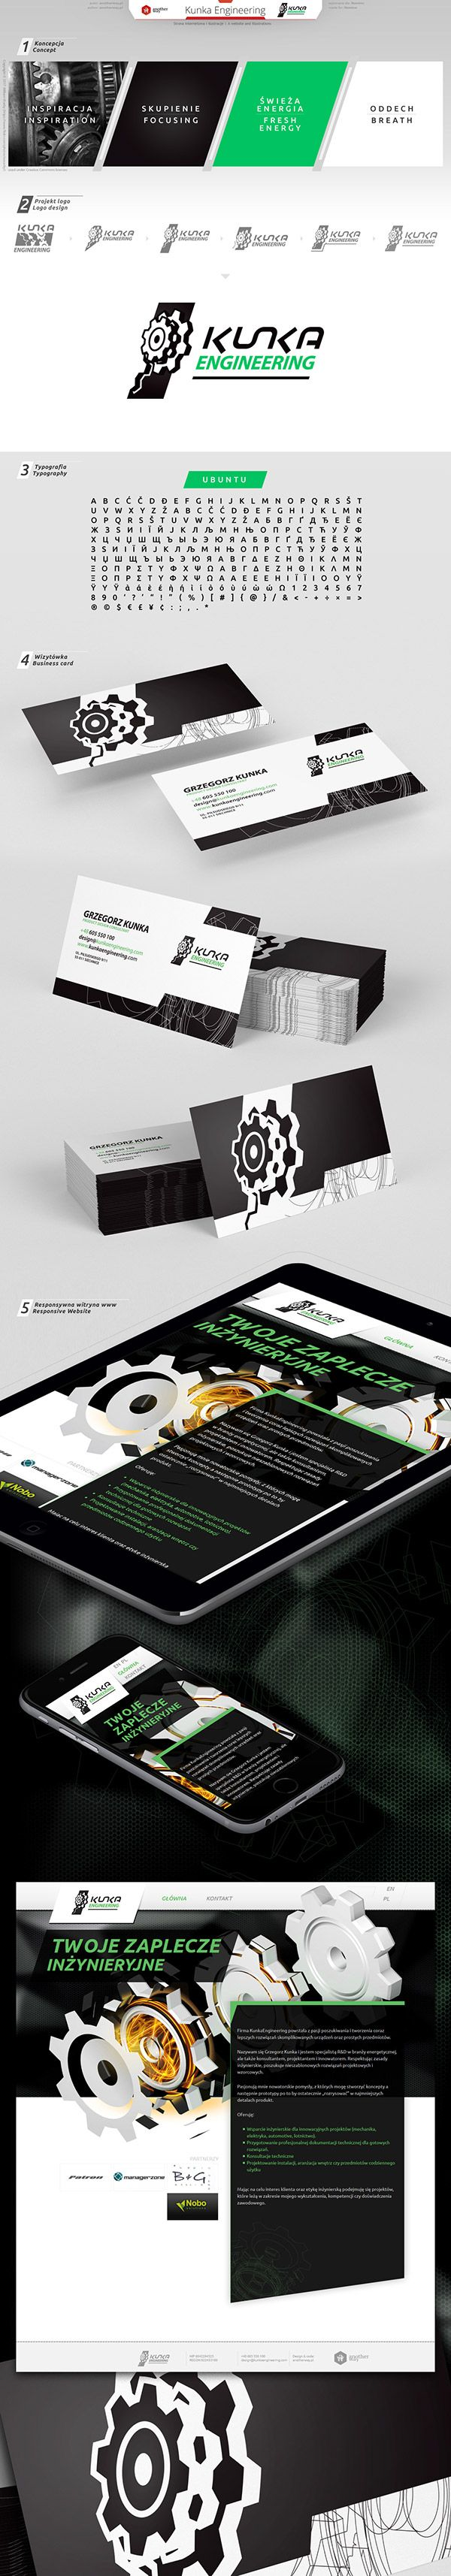 Kunka Engineering #businesscard, #logo, #Website, #wordpress, #gears, #responsive, #energy